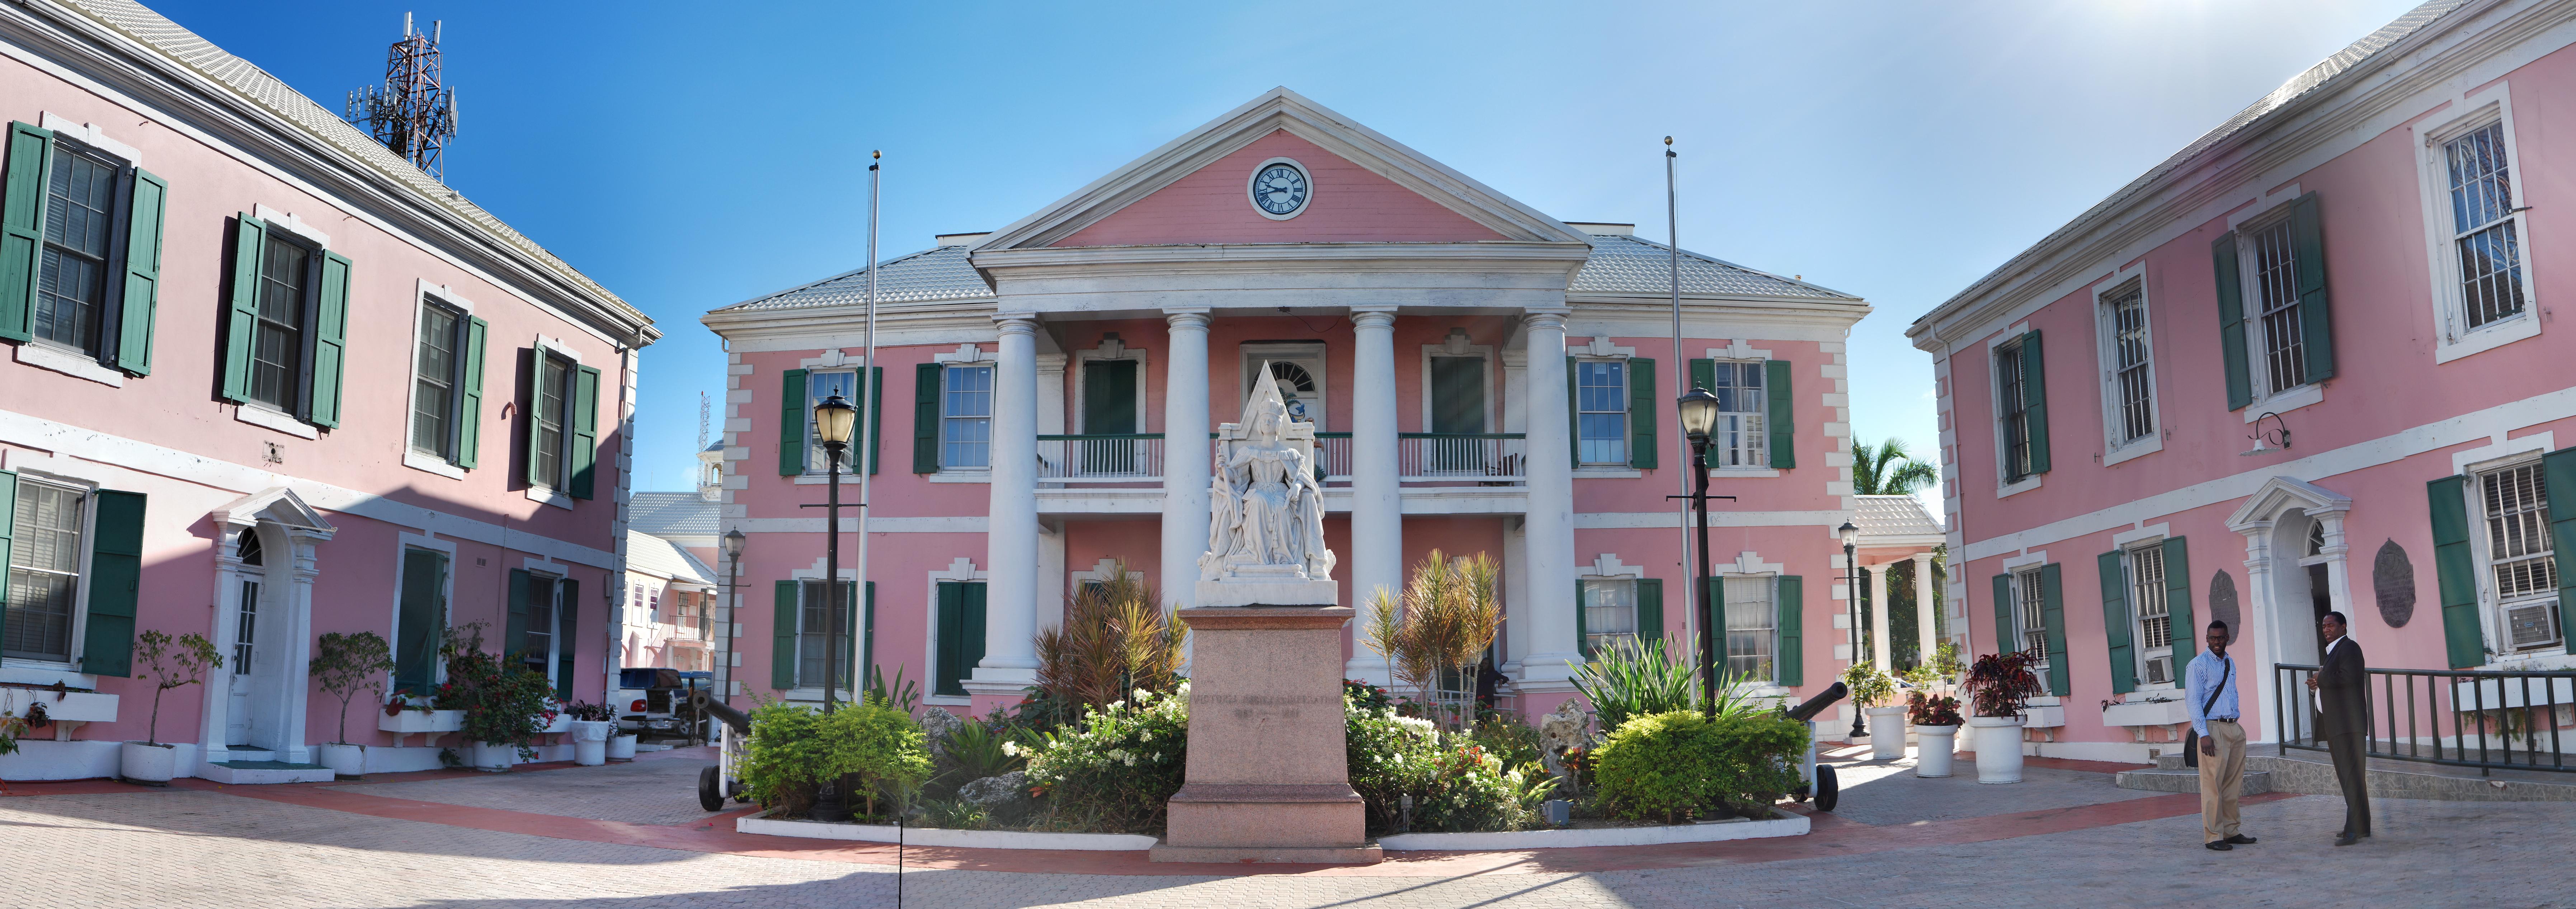 bahamian-parliament-bahama-parlamentosu